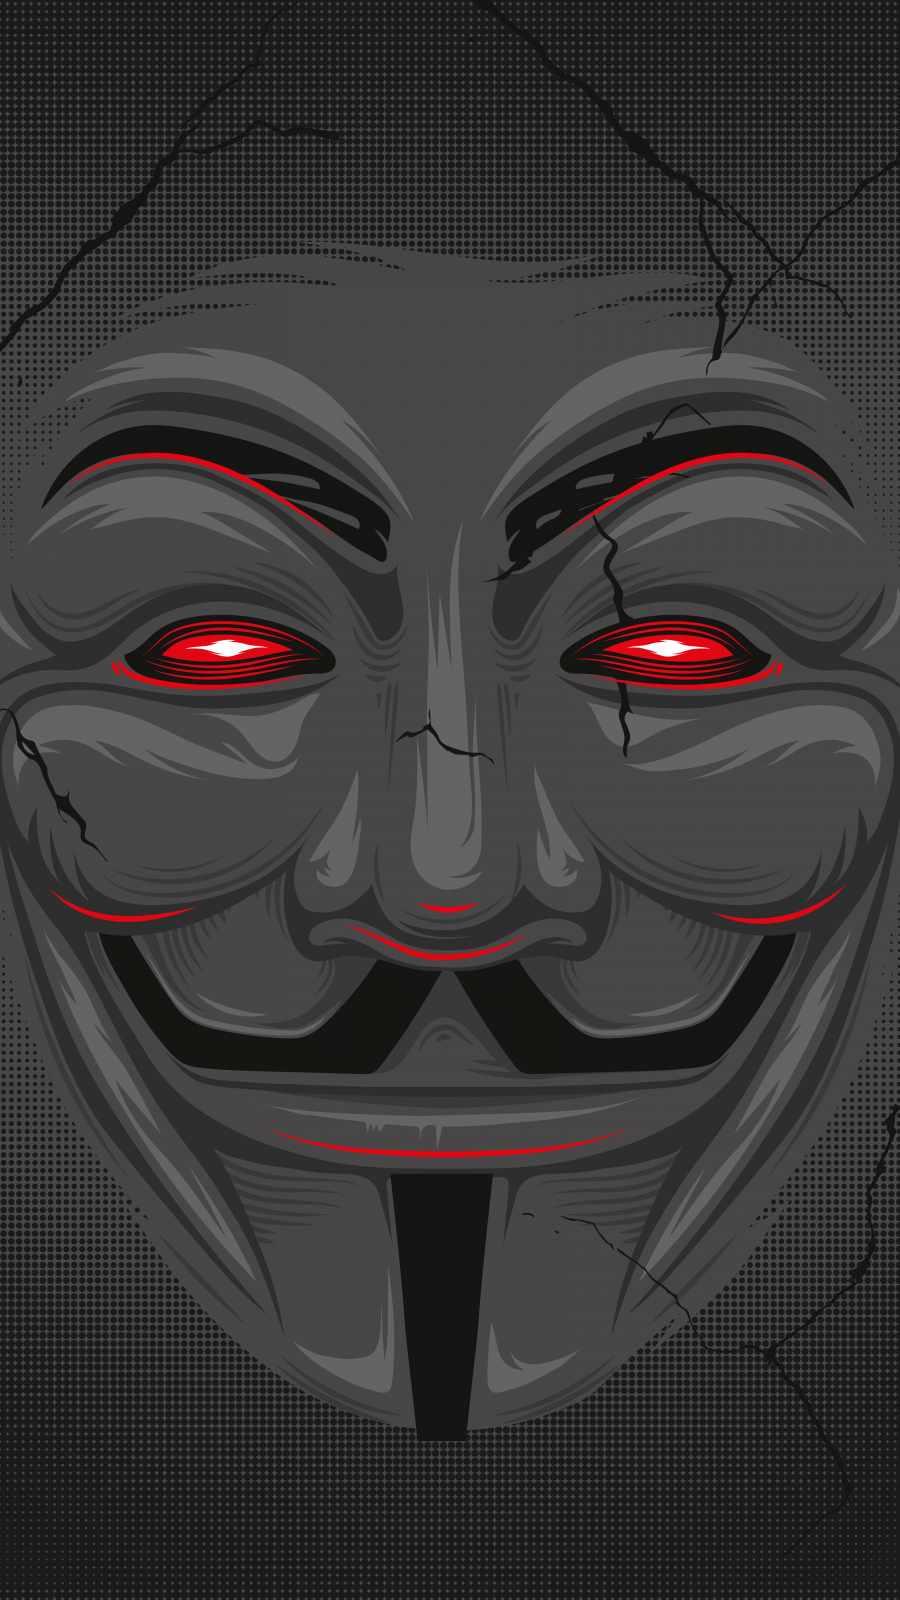 Vendetta Mask Art